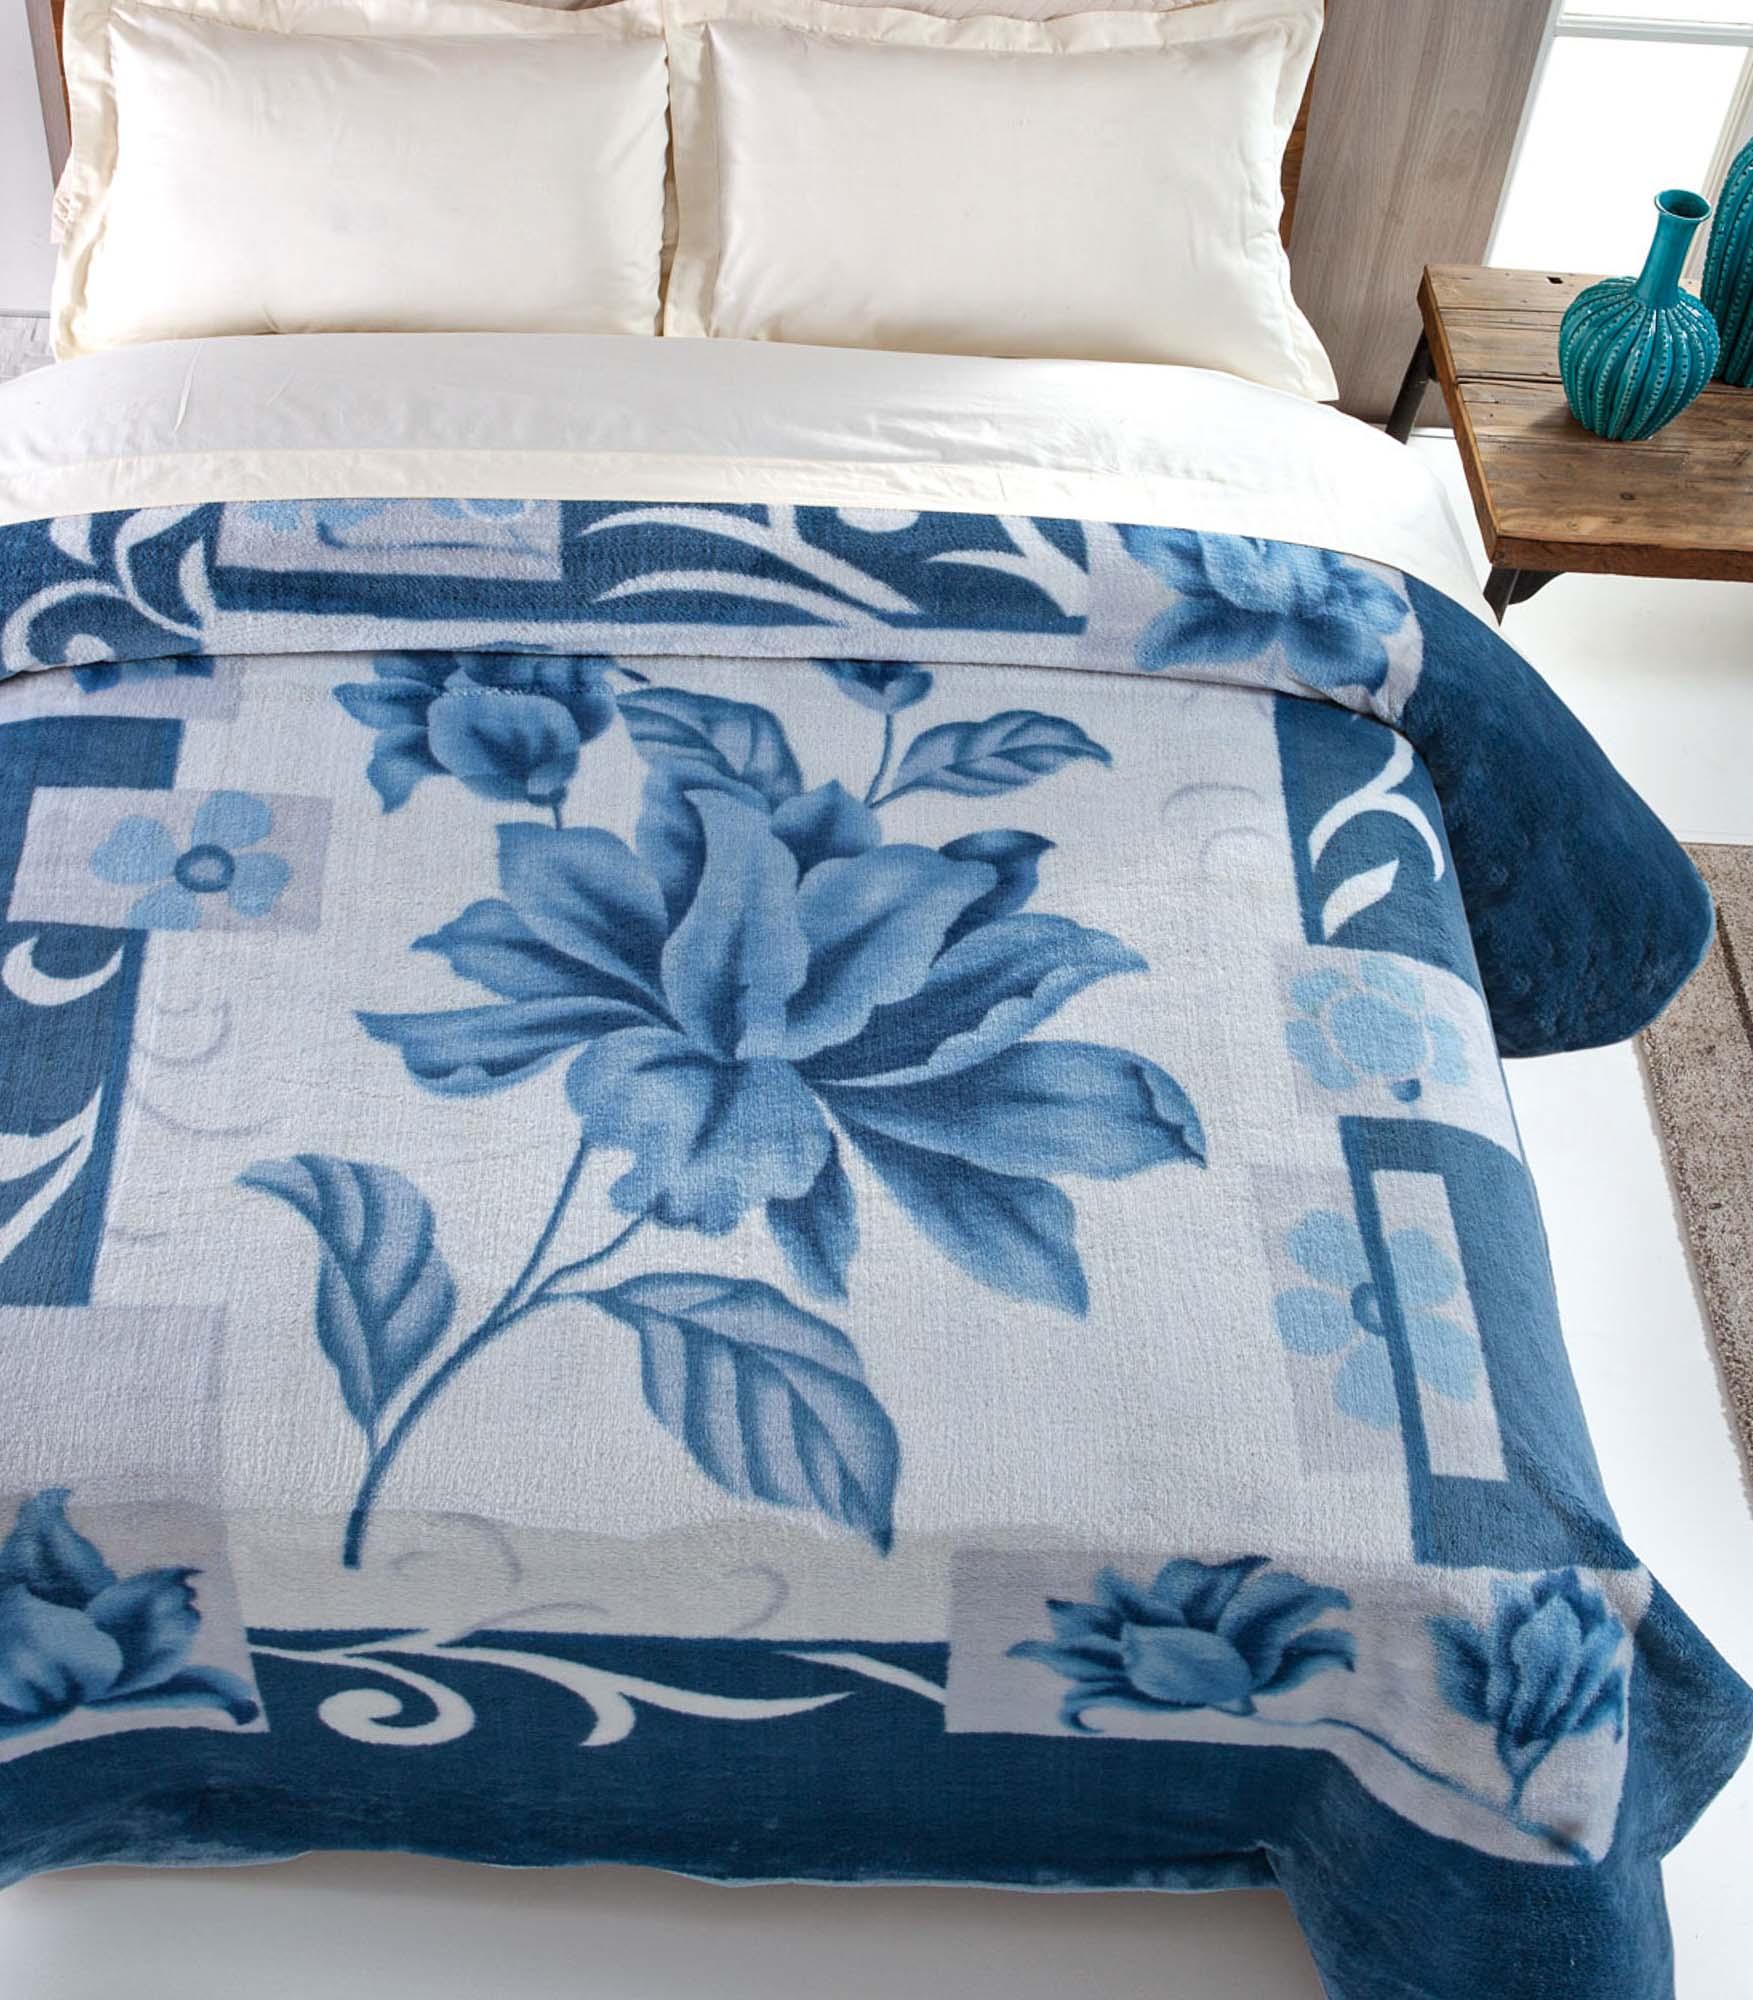 Cobertor Jolitex Casal Kyor Plus 1,80x2,20m Soft Malbec Azul